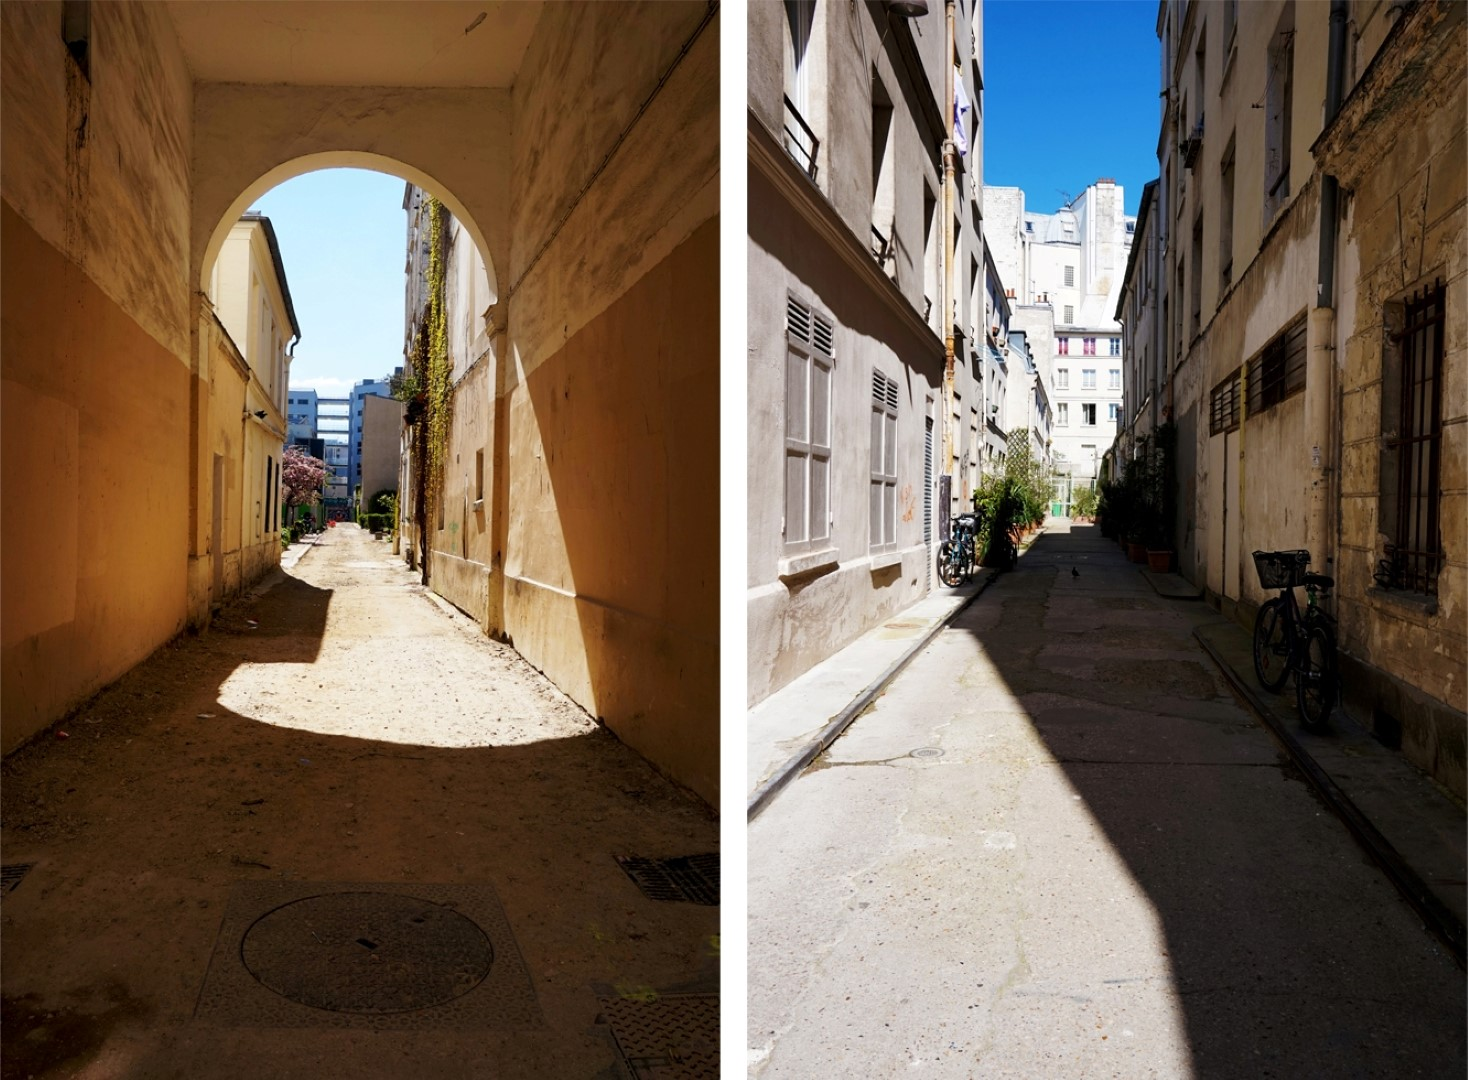 Balade dans le 11e - Rue Popincourt